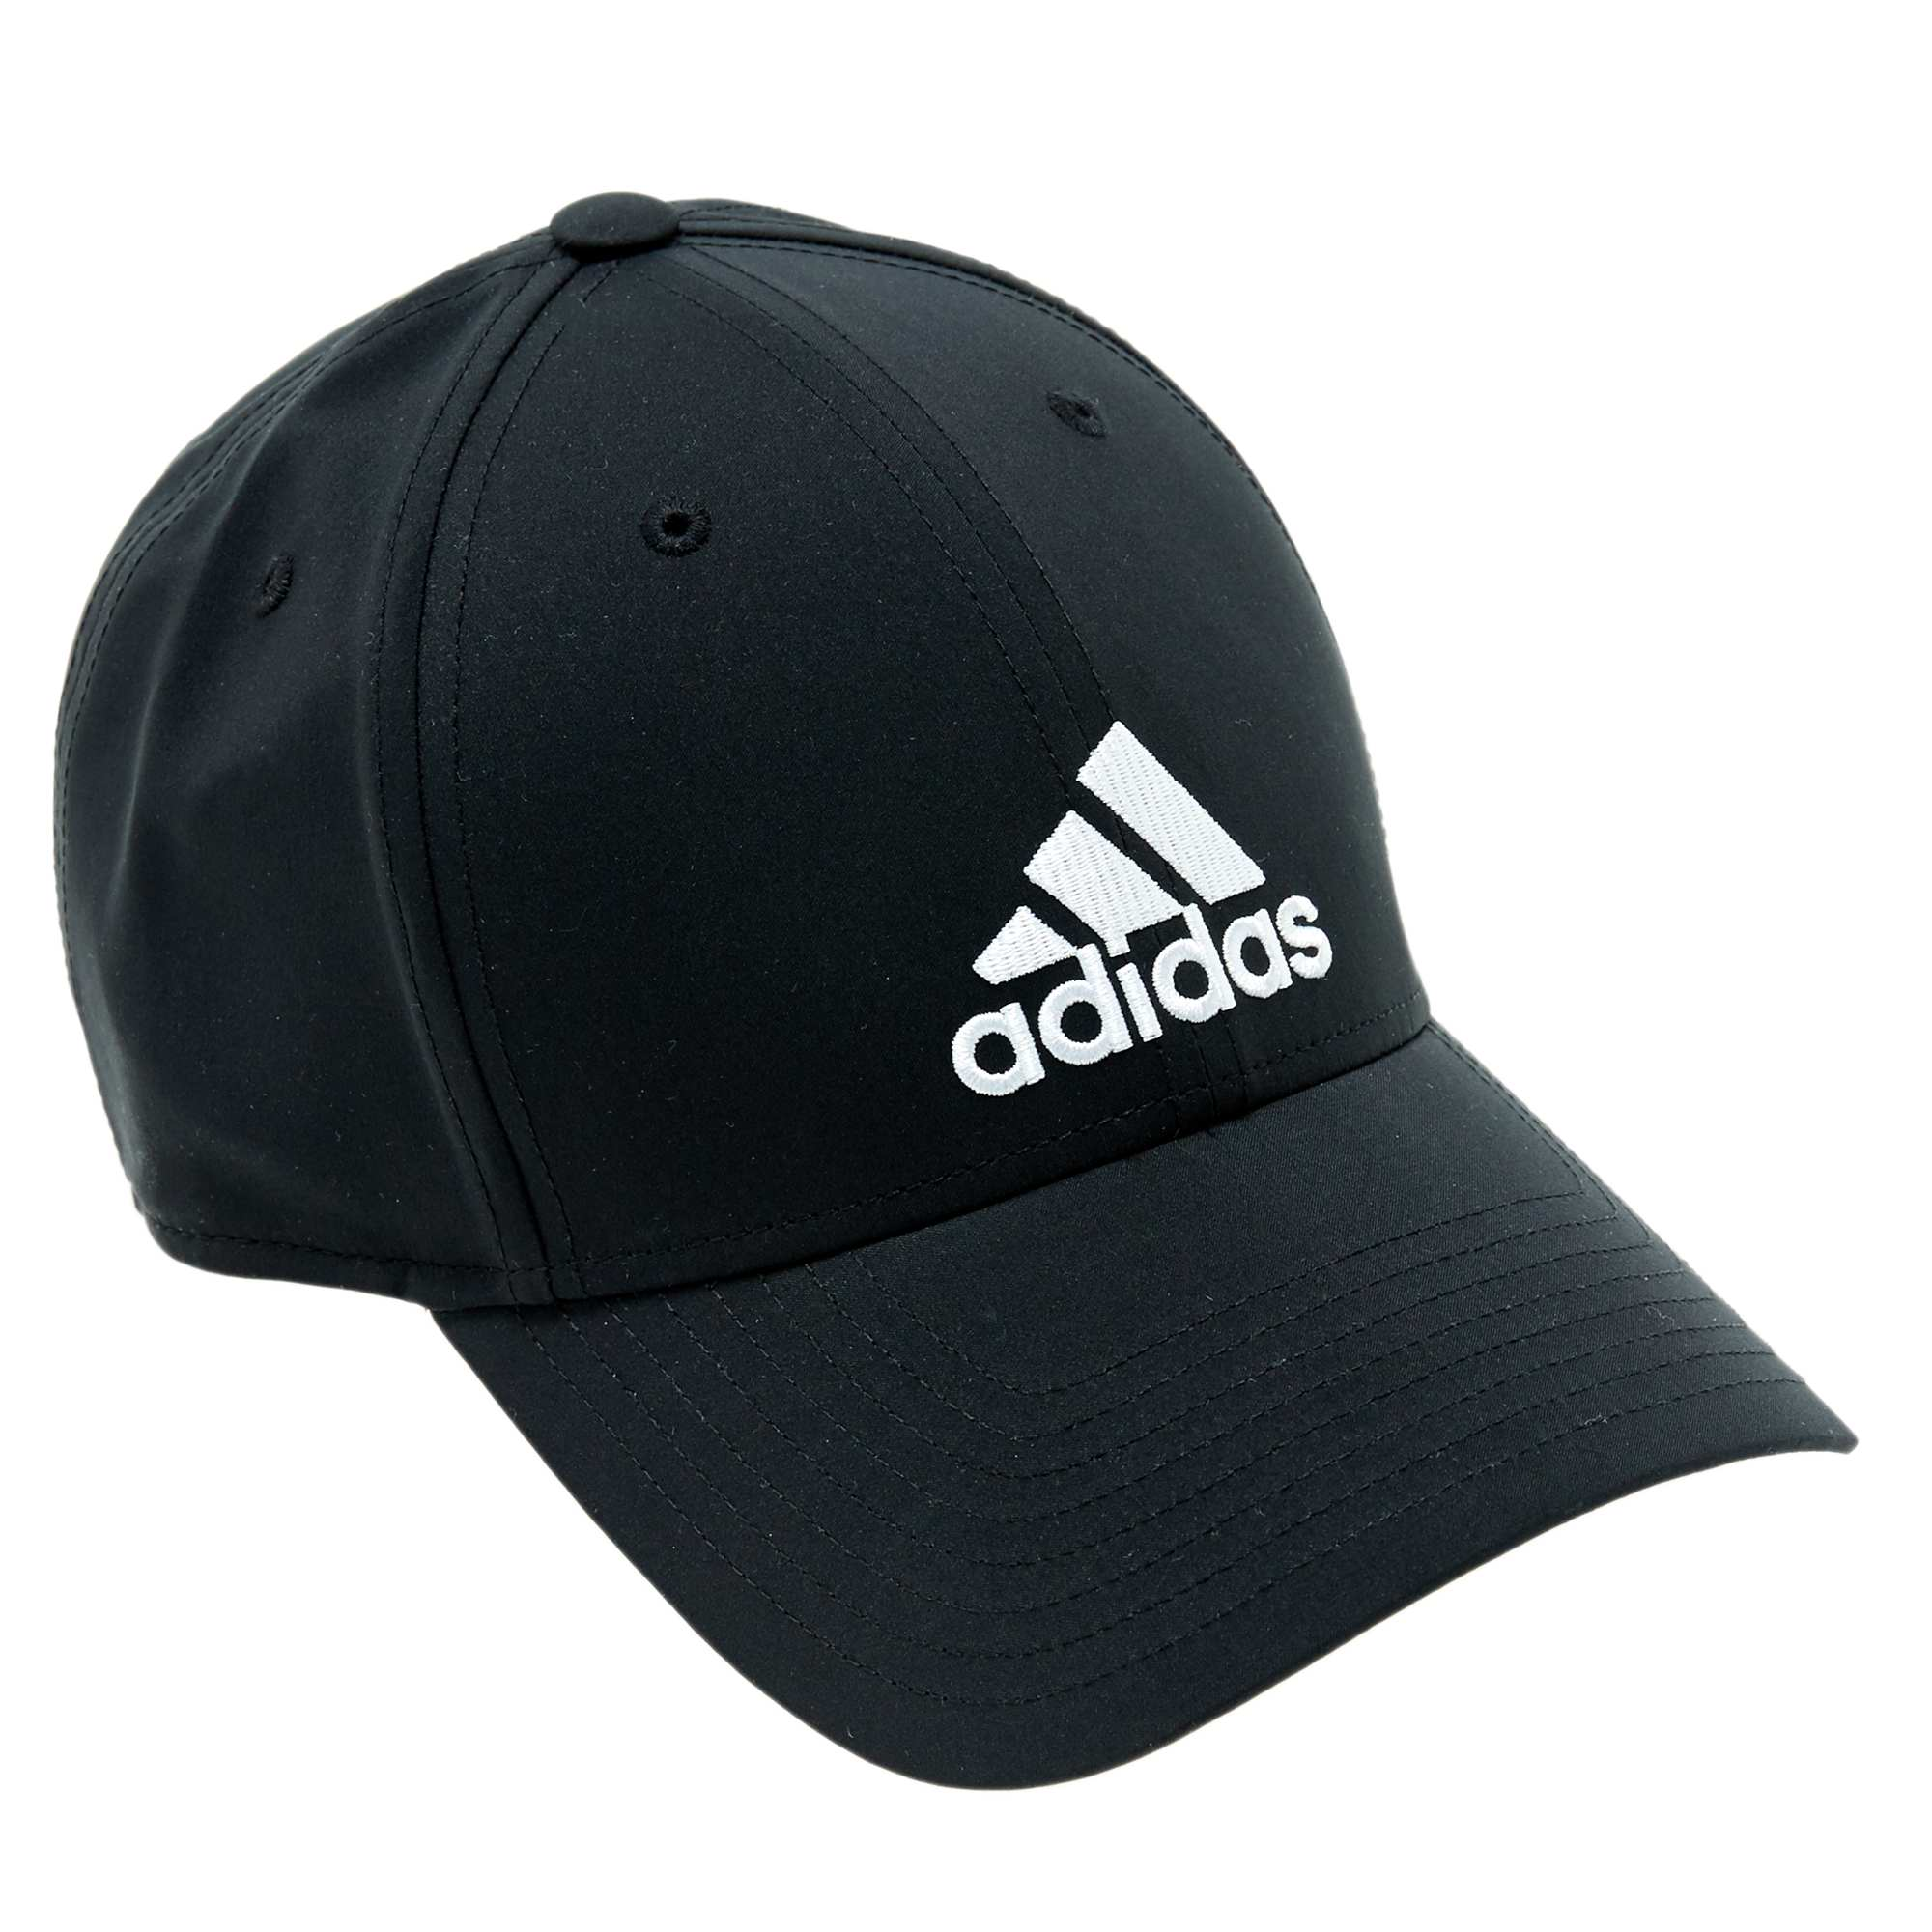 29939a327 gorras adidas deportivas